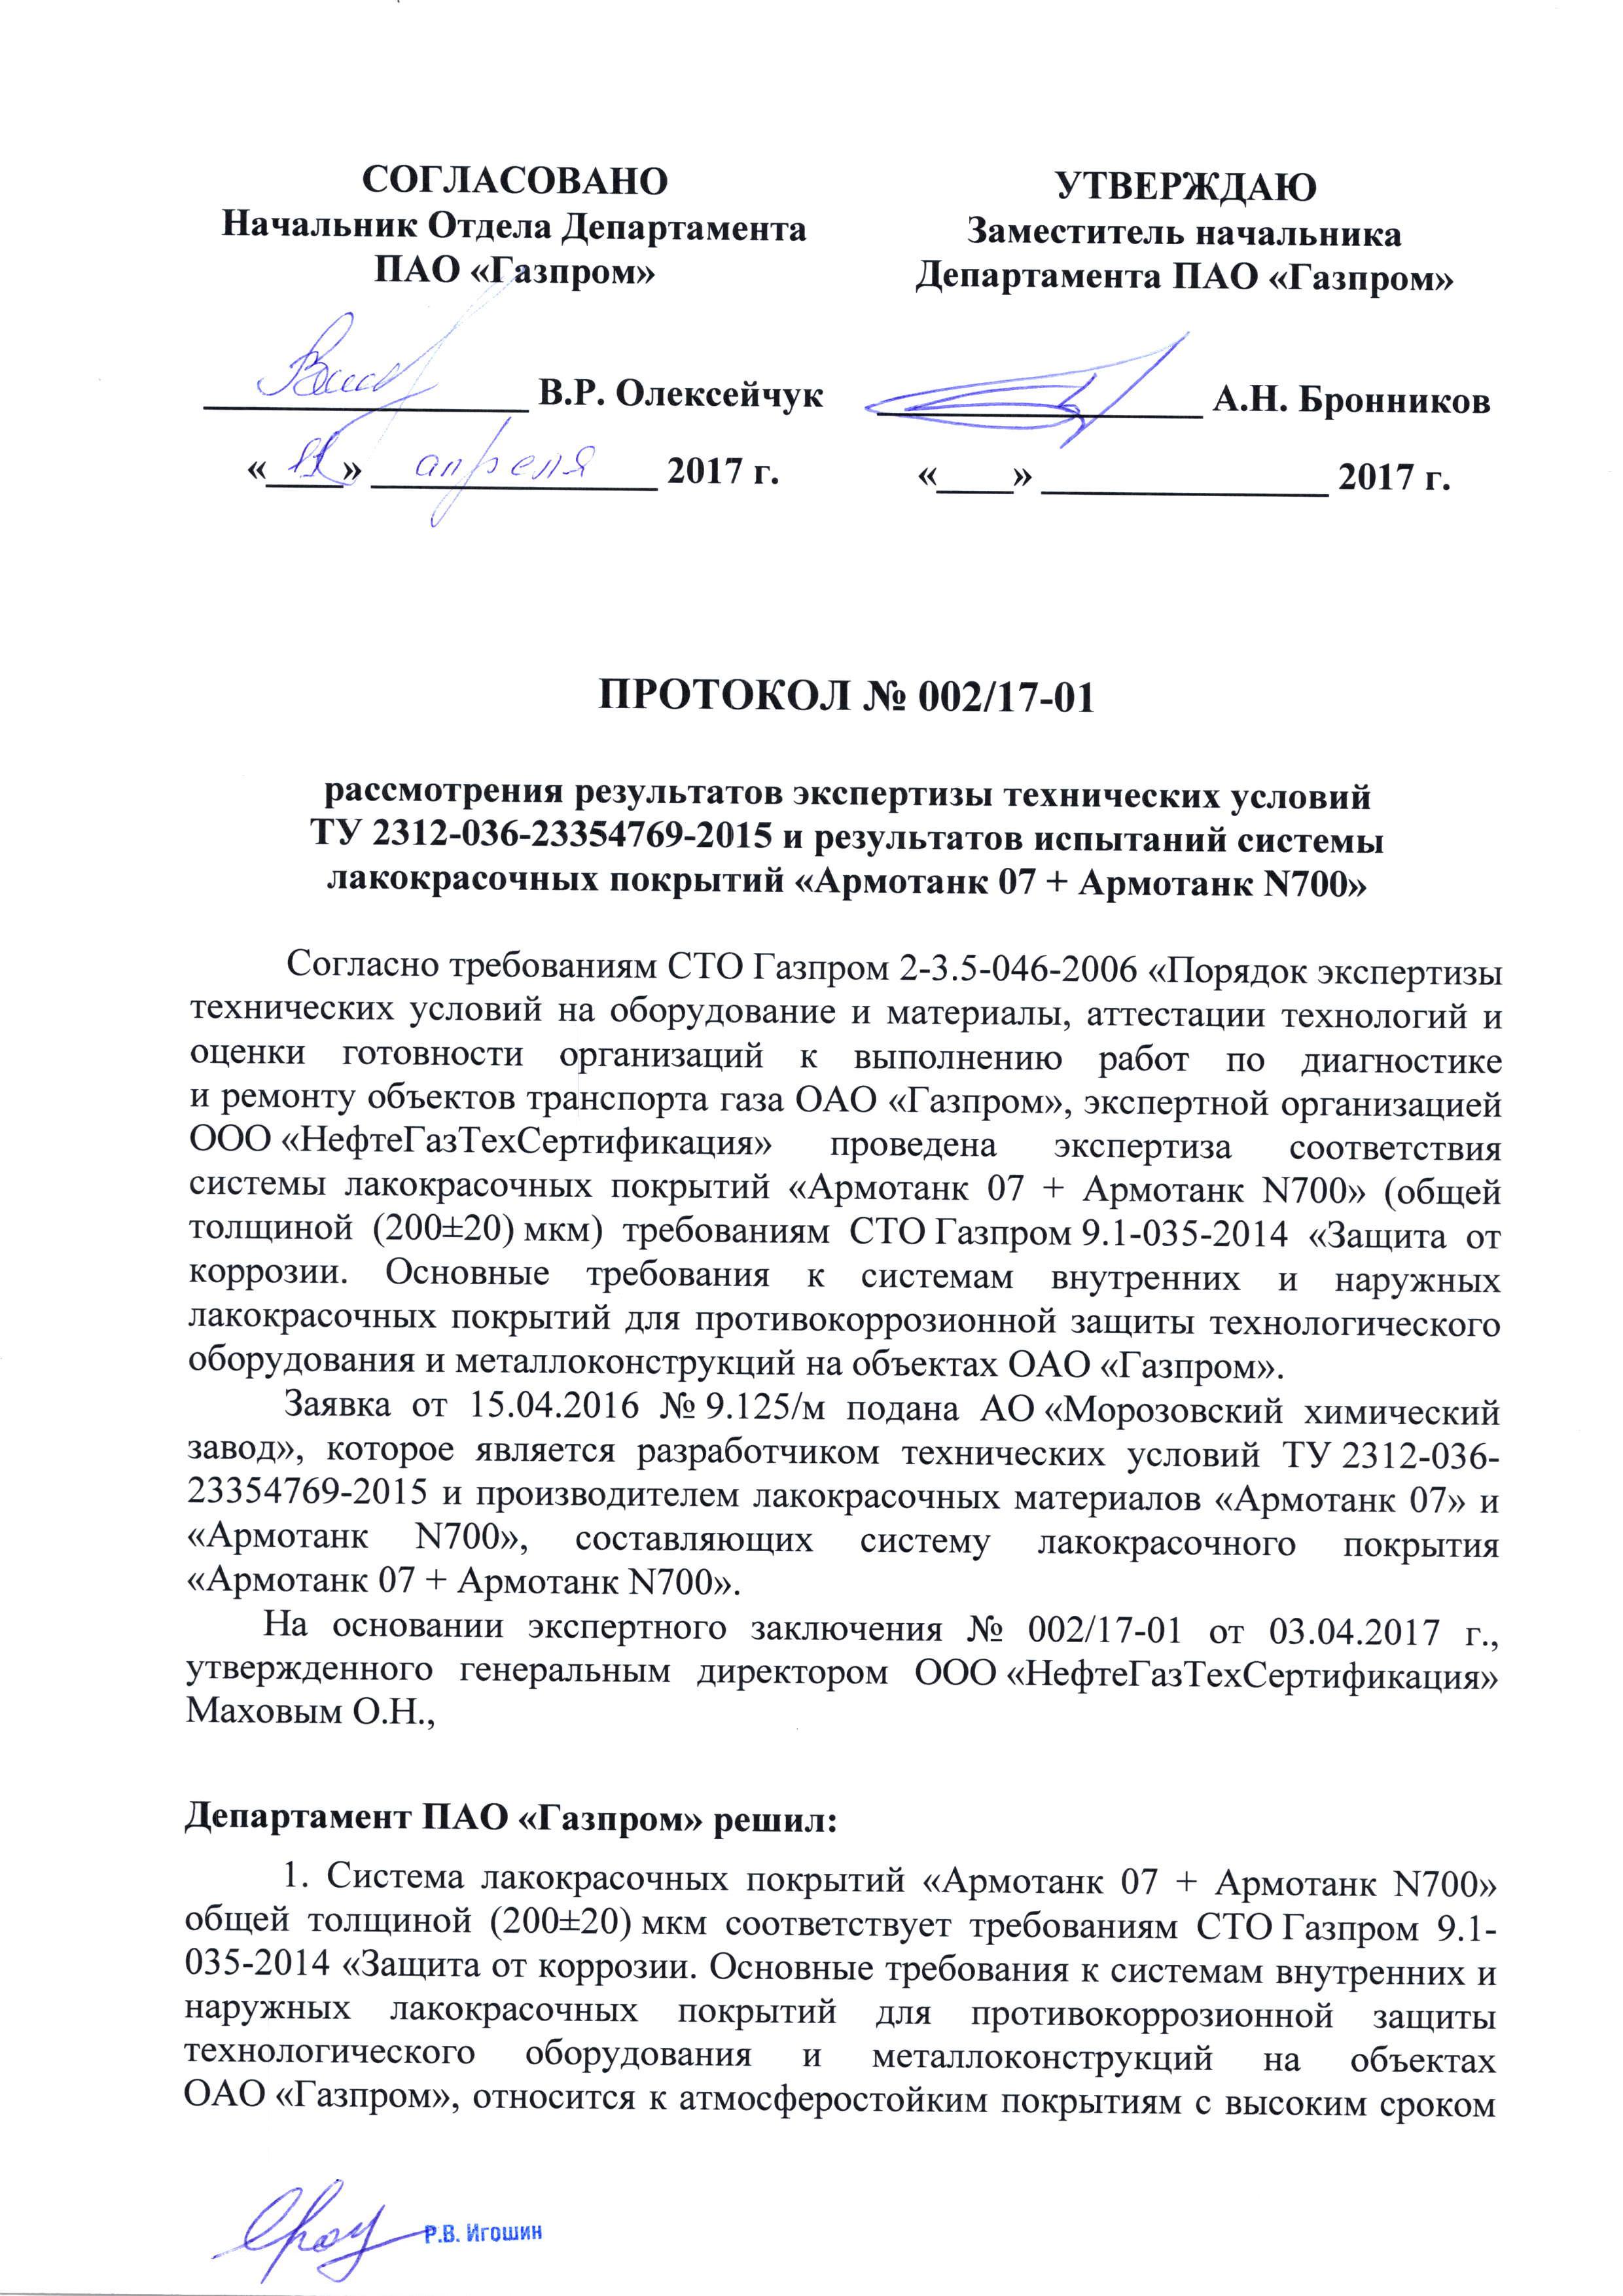 Газпром протокол № 002-17-01 07+N700_Страница_1